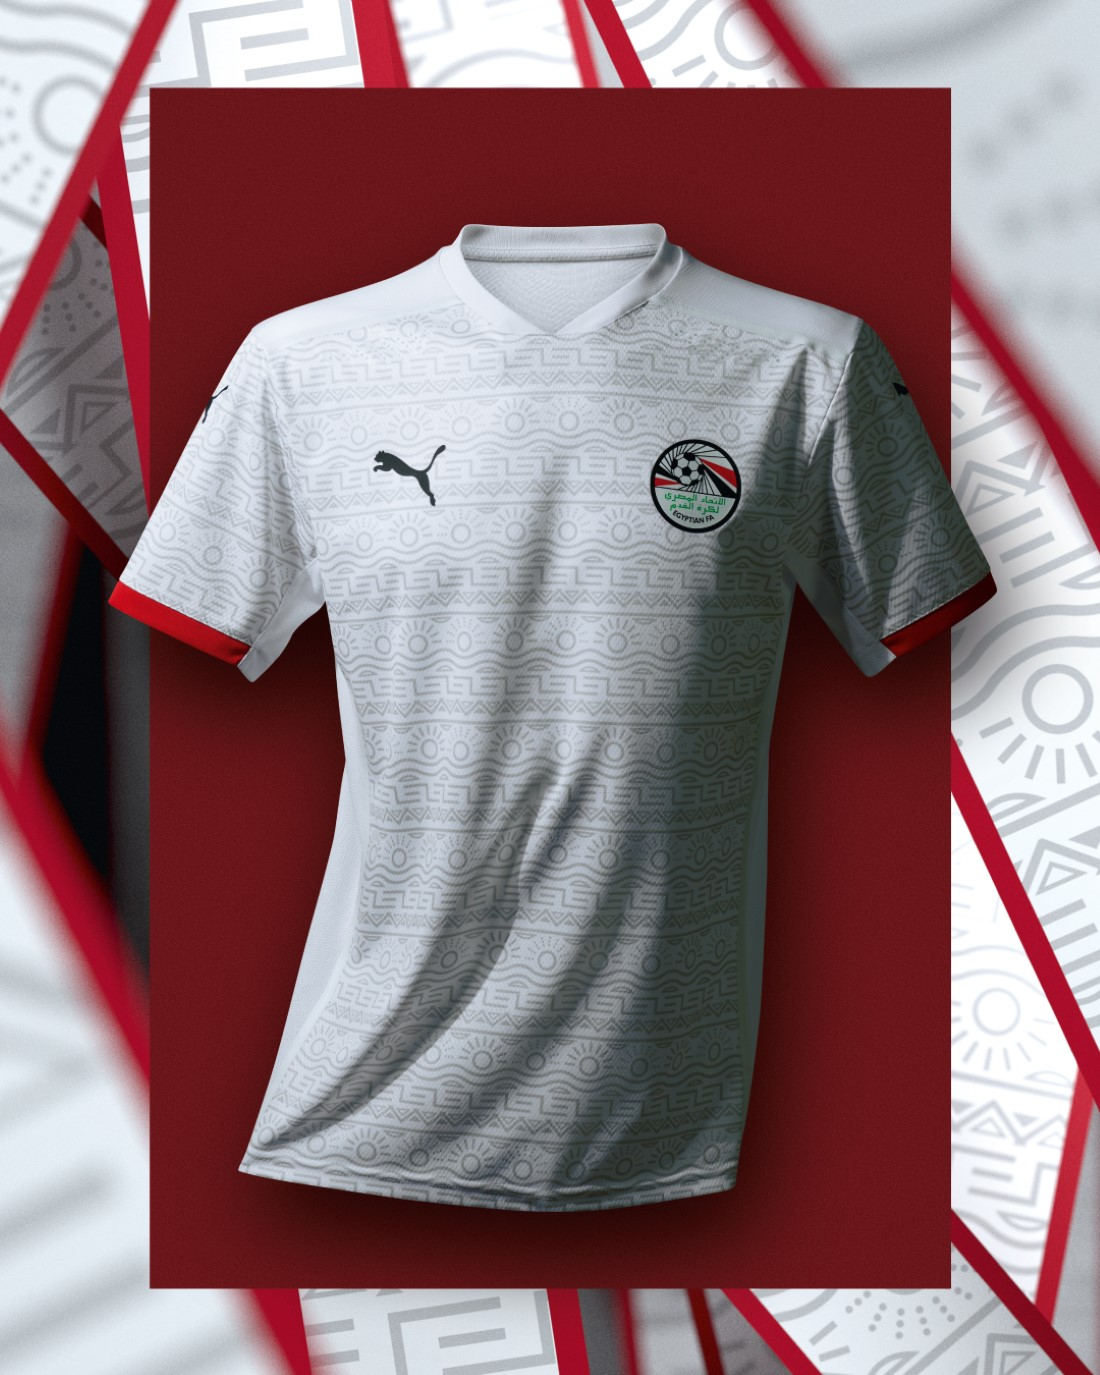 PUMA Football - Sélection Egype 2020-2021 - Away Kit